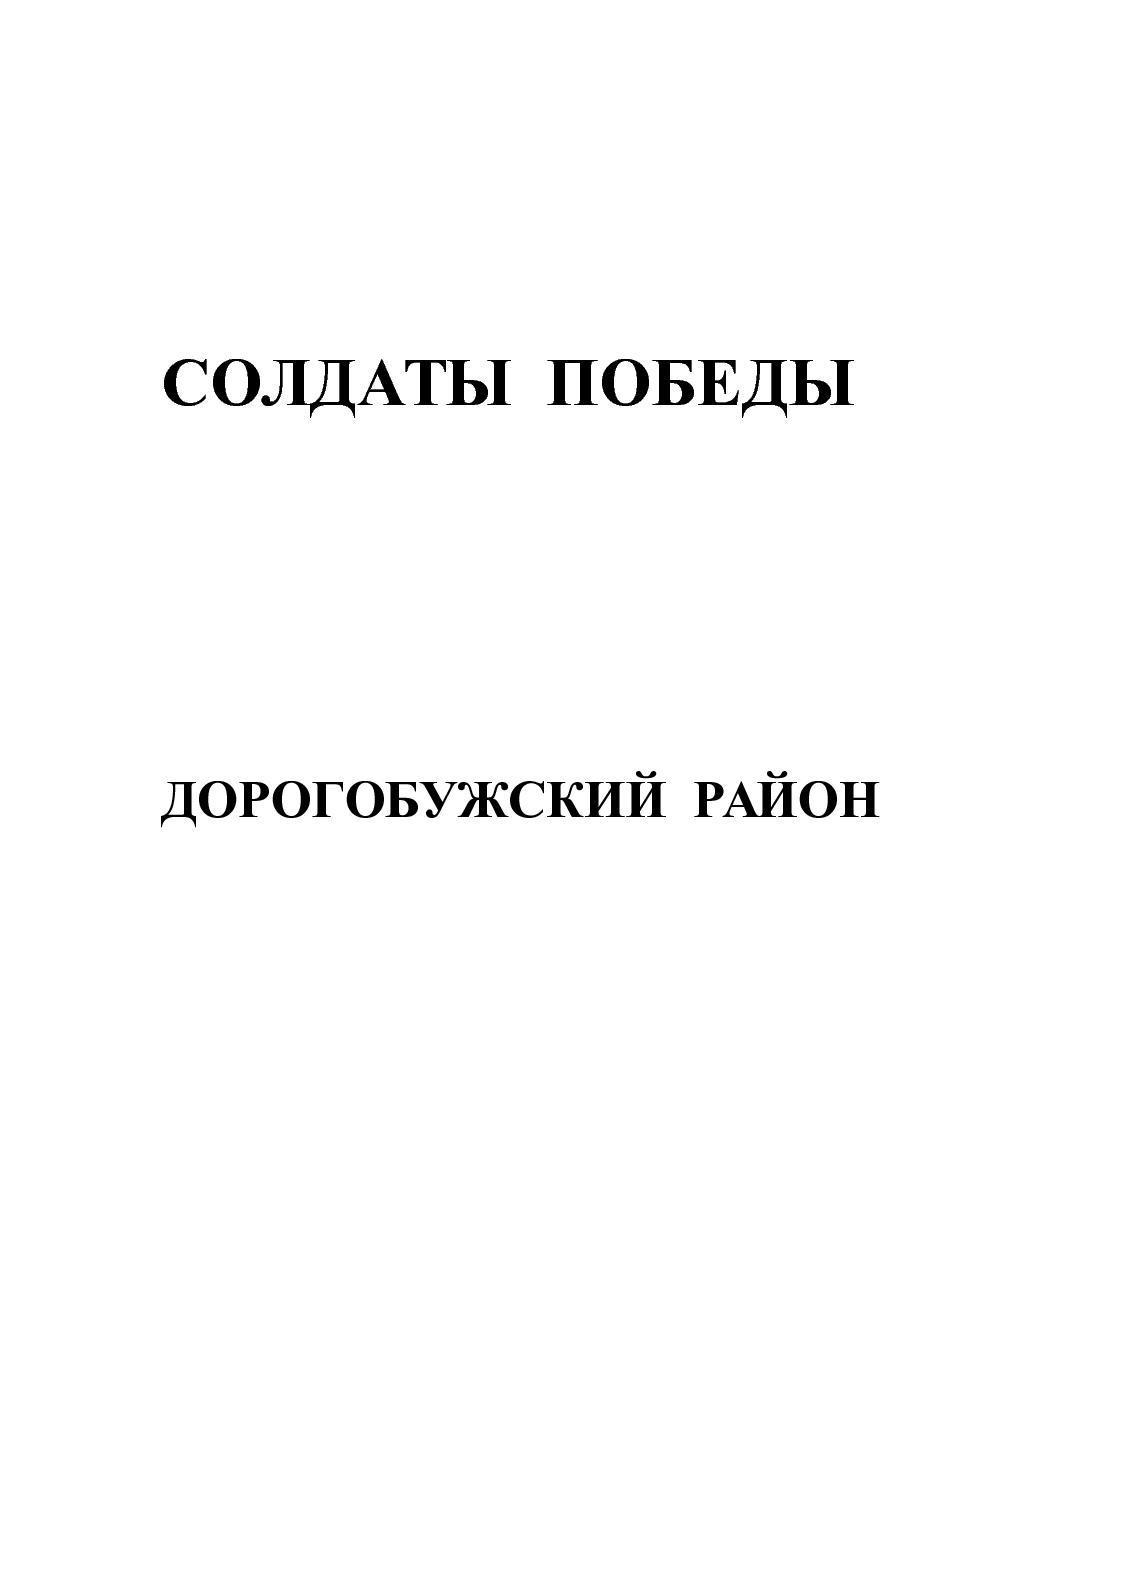 Стародубов дмитрий яковлевич занимал пост